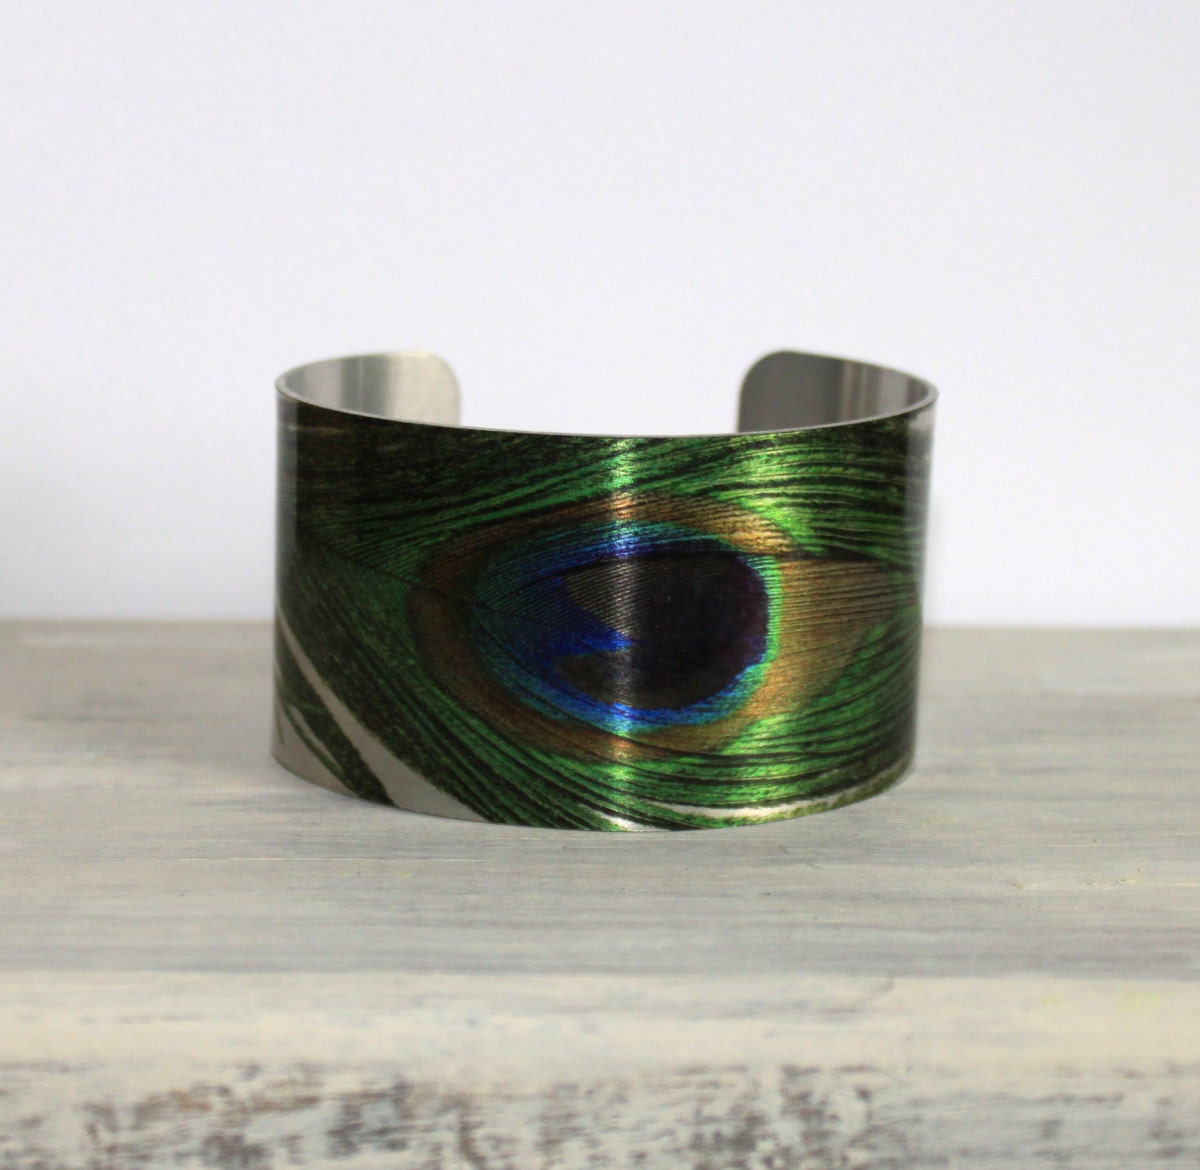 PEACOCK Cuff Bracelet - Metal Cuff - Aluminum Cuff Bracelet - Large Bold Bracelet - Wide Cuff Jewelry - Feather Bracelet